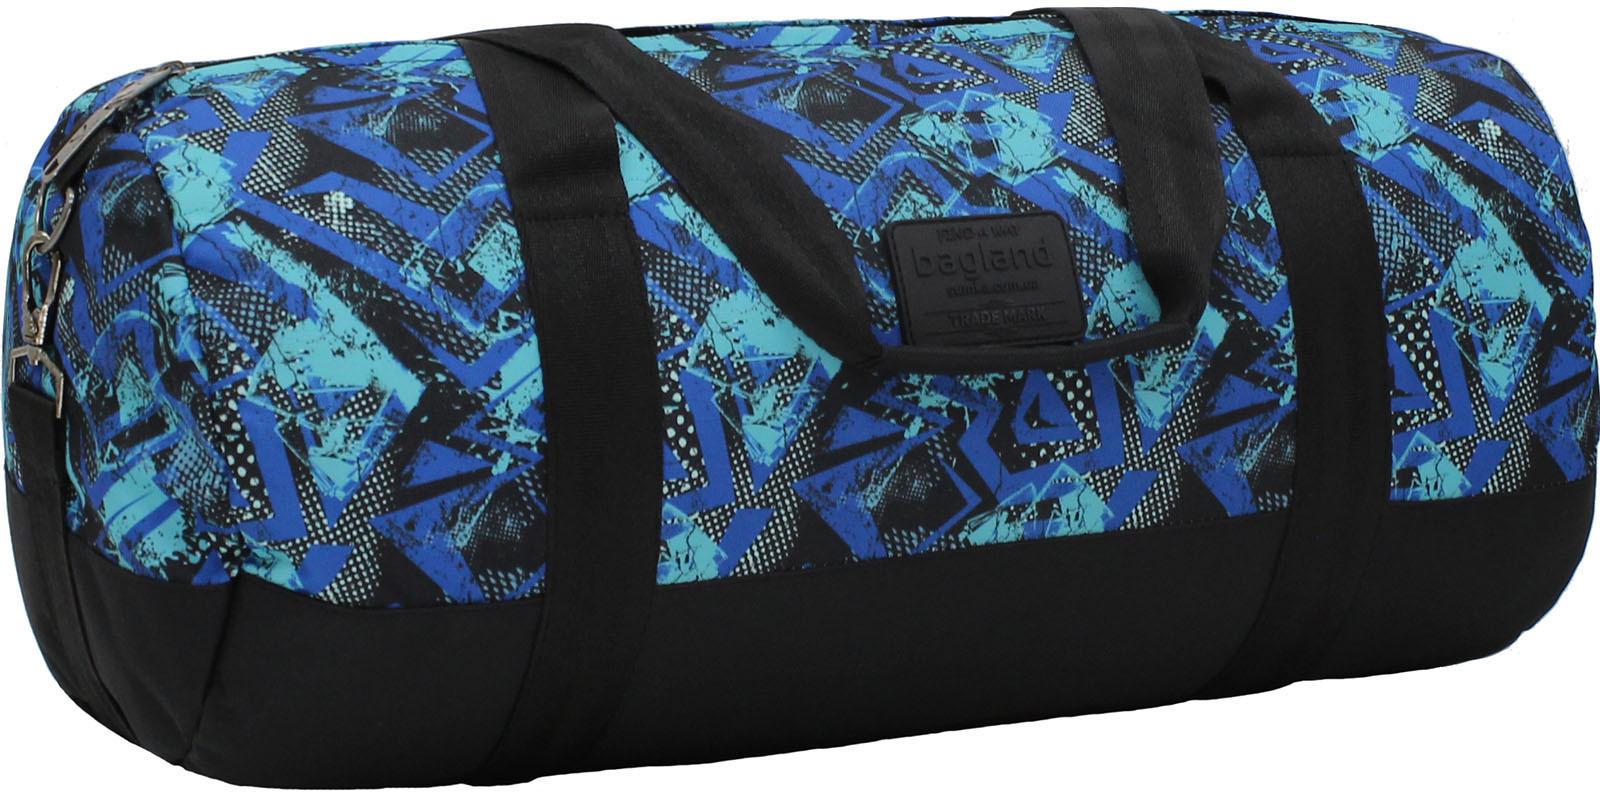 Спортивные сумки Сумка Bagland Staff 30 л. сублімація 212 (00300664) IMG_6079.JPG